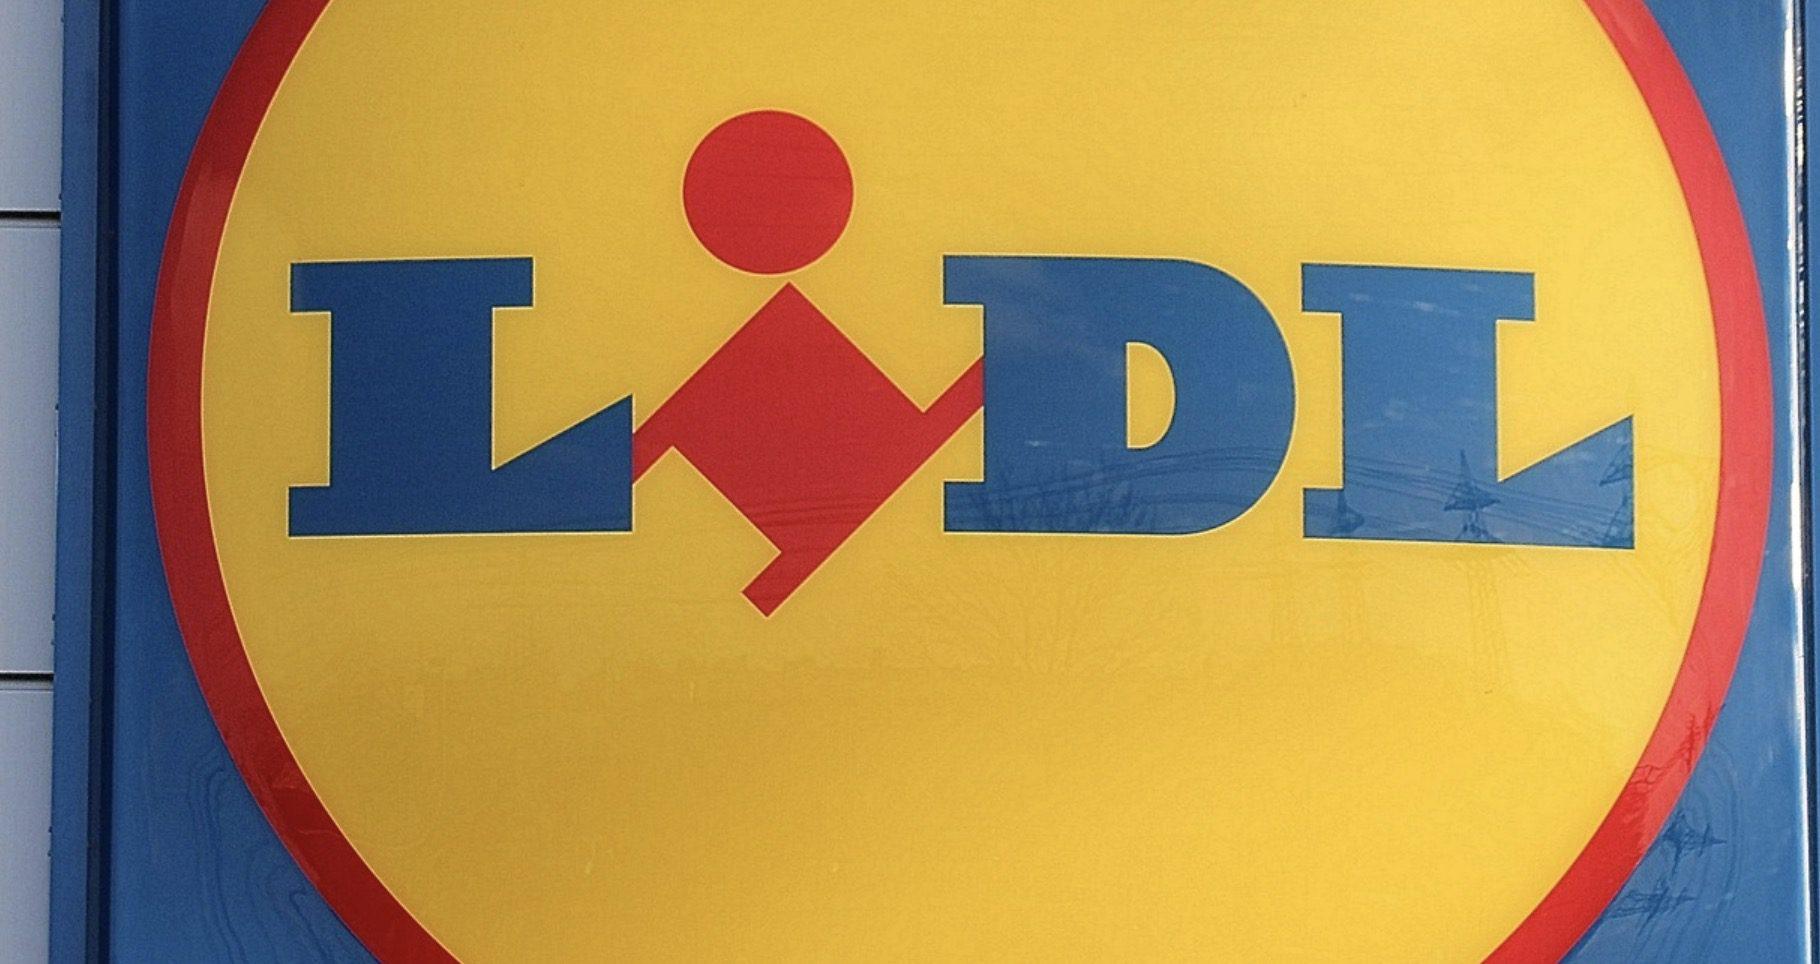 Lidl et Danone